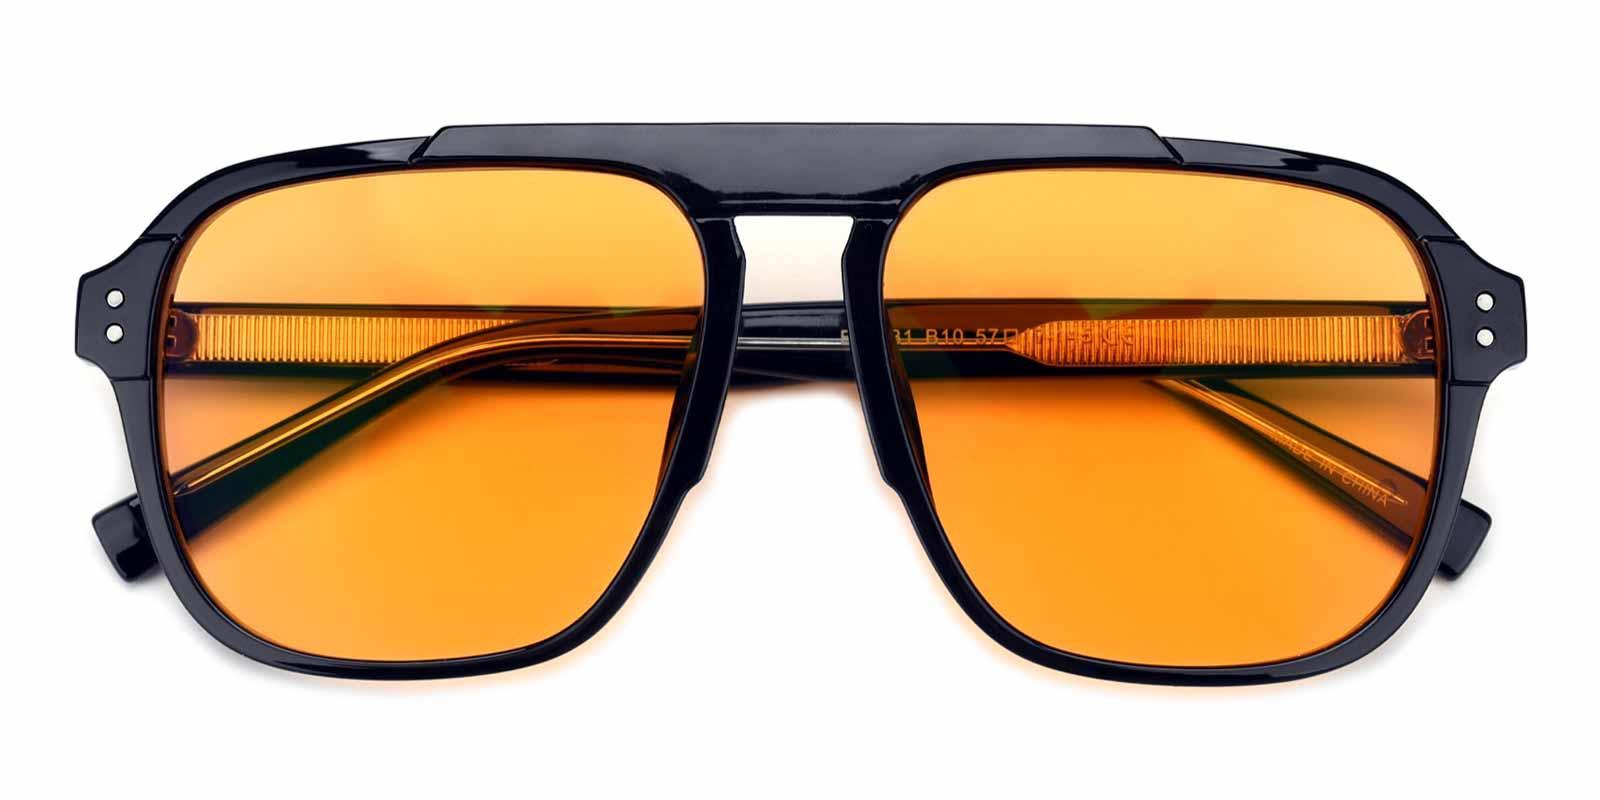 Floating Car-Yellow-Aviator-Acetate-Sunglasses-detail